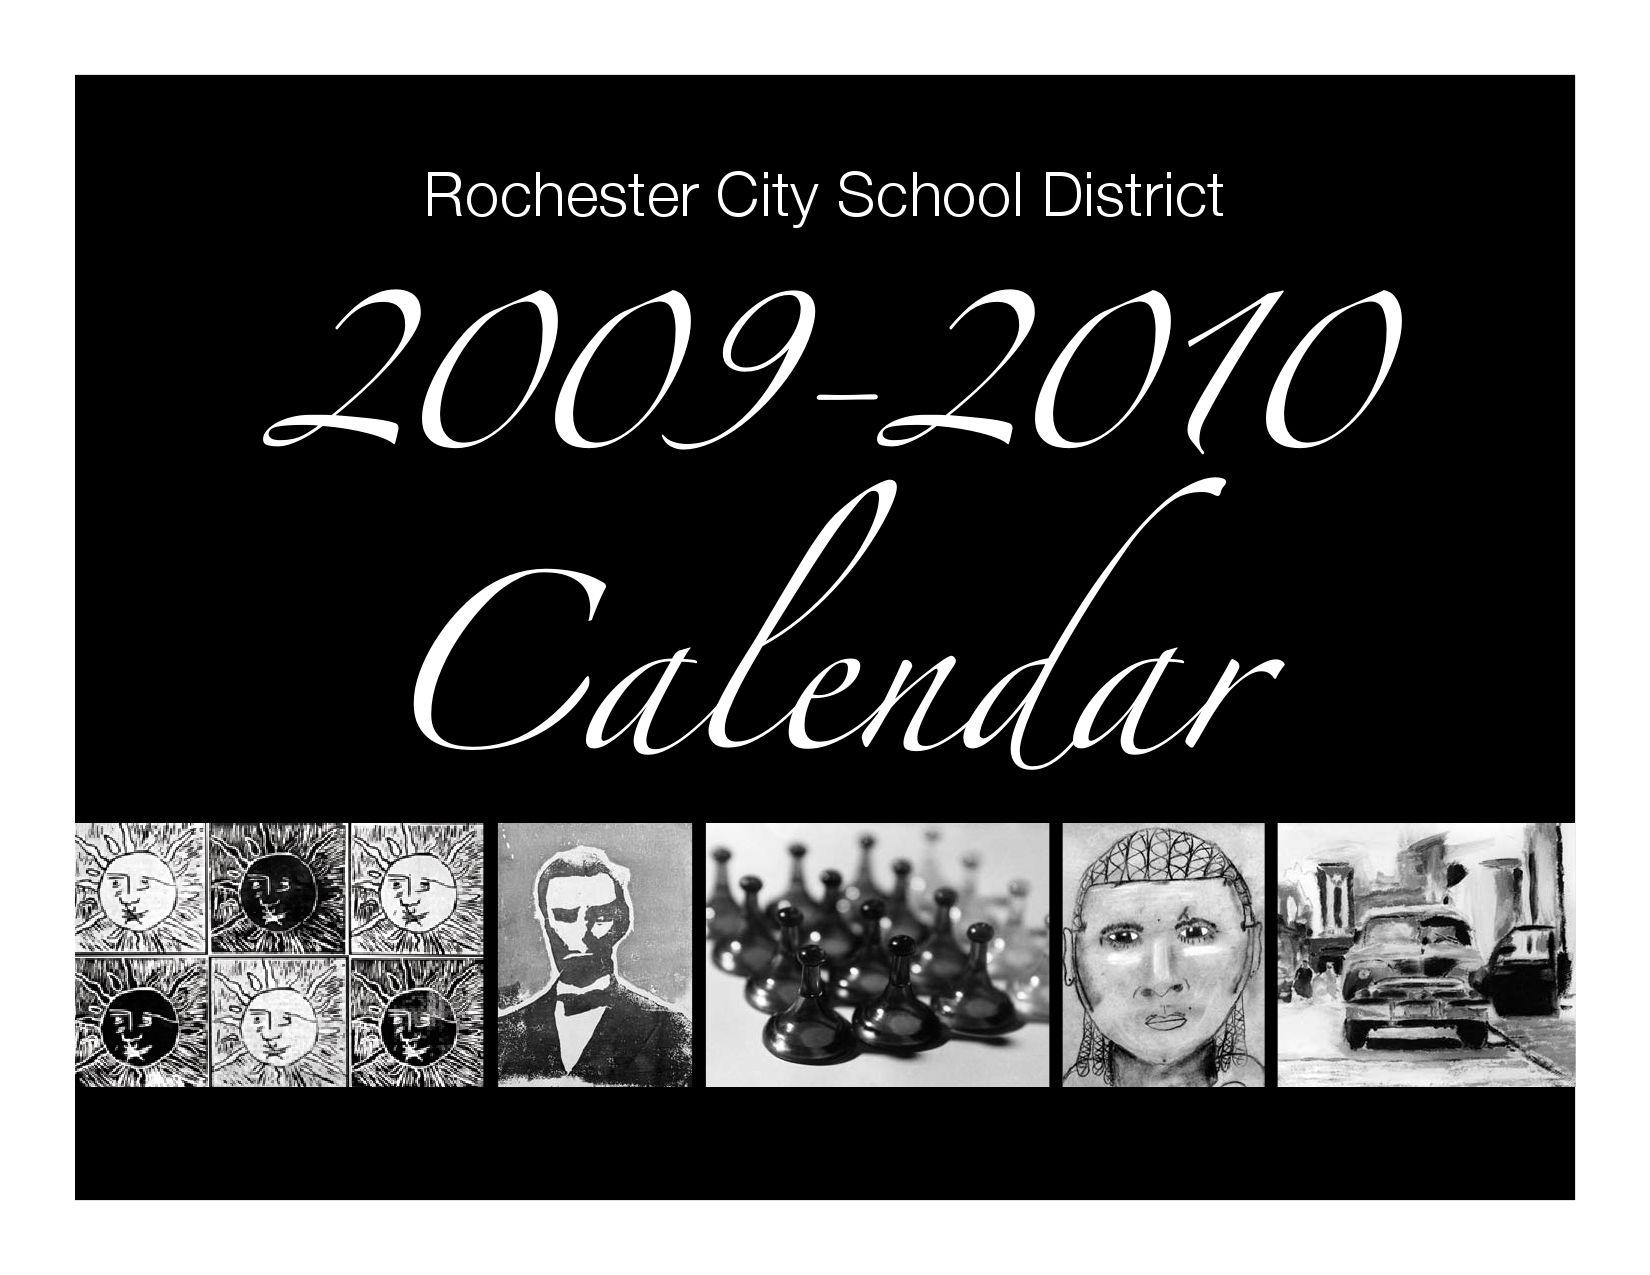 Rochester City School District Calendar 2009-2010Sam regarding Rochester City School District Calendar